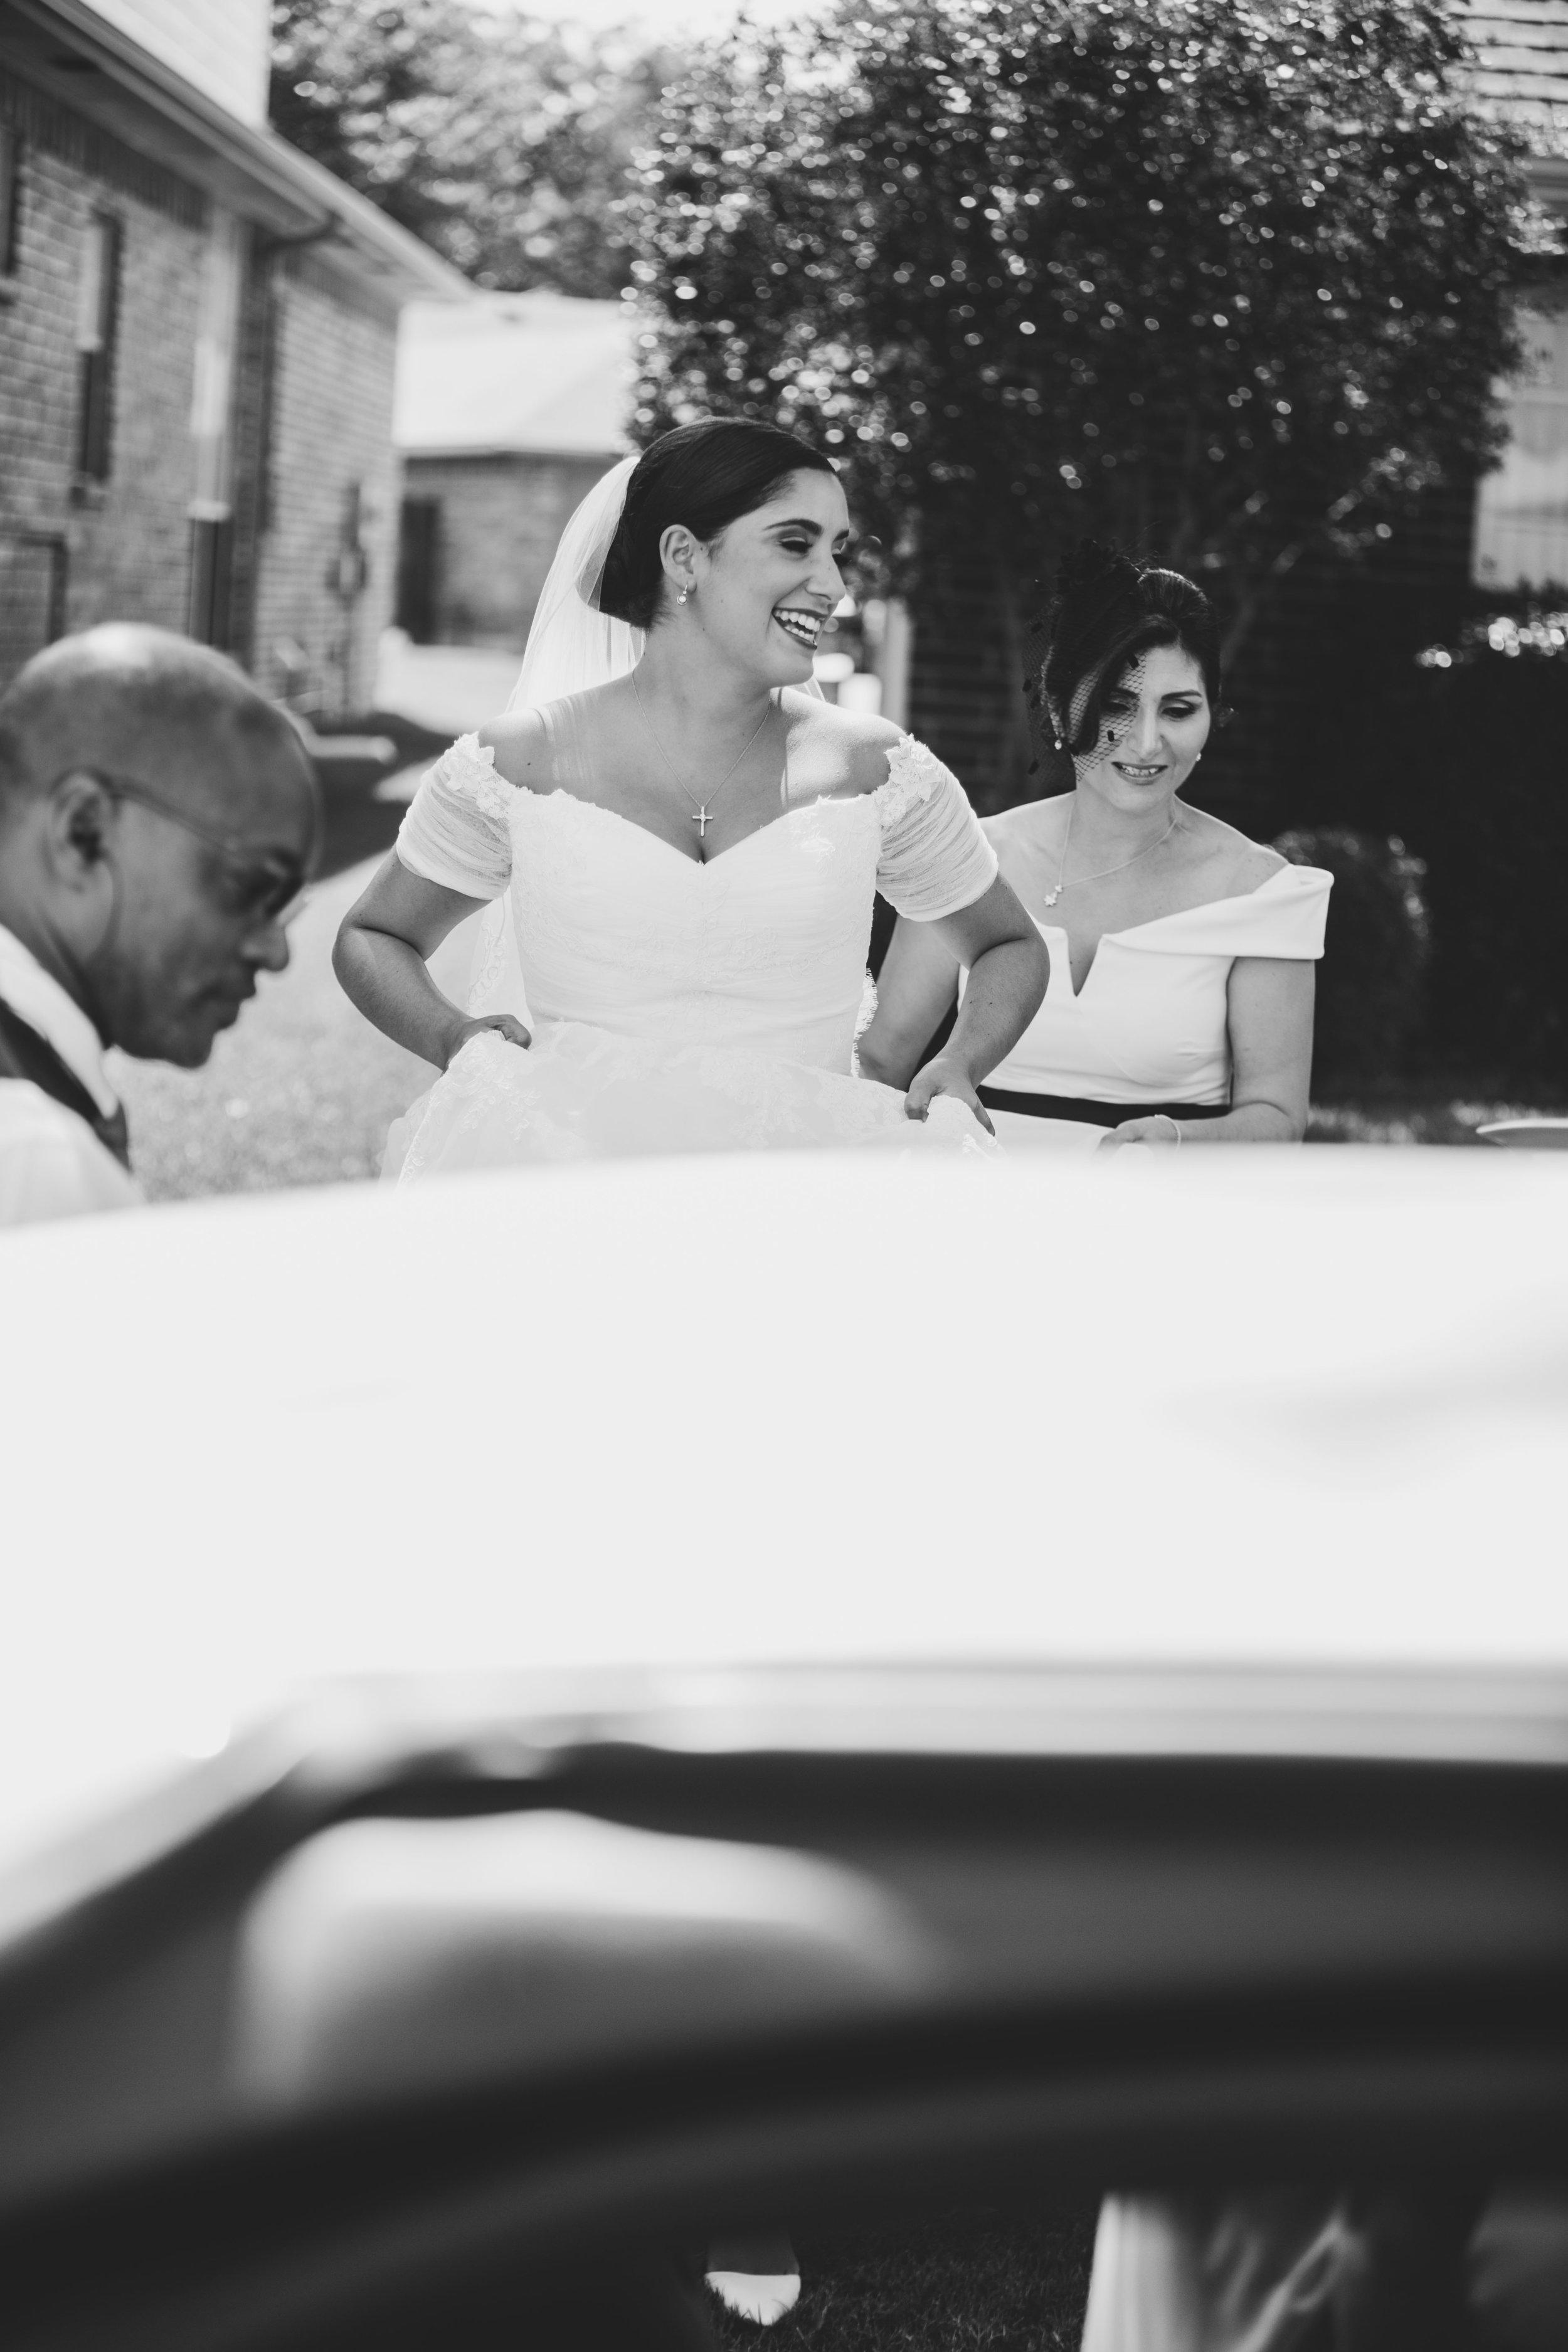 ATGI_Magali & Josh Wedding_2S8A0339.jpg